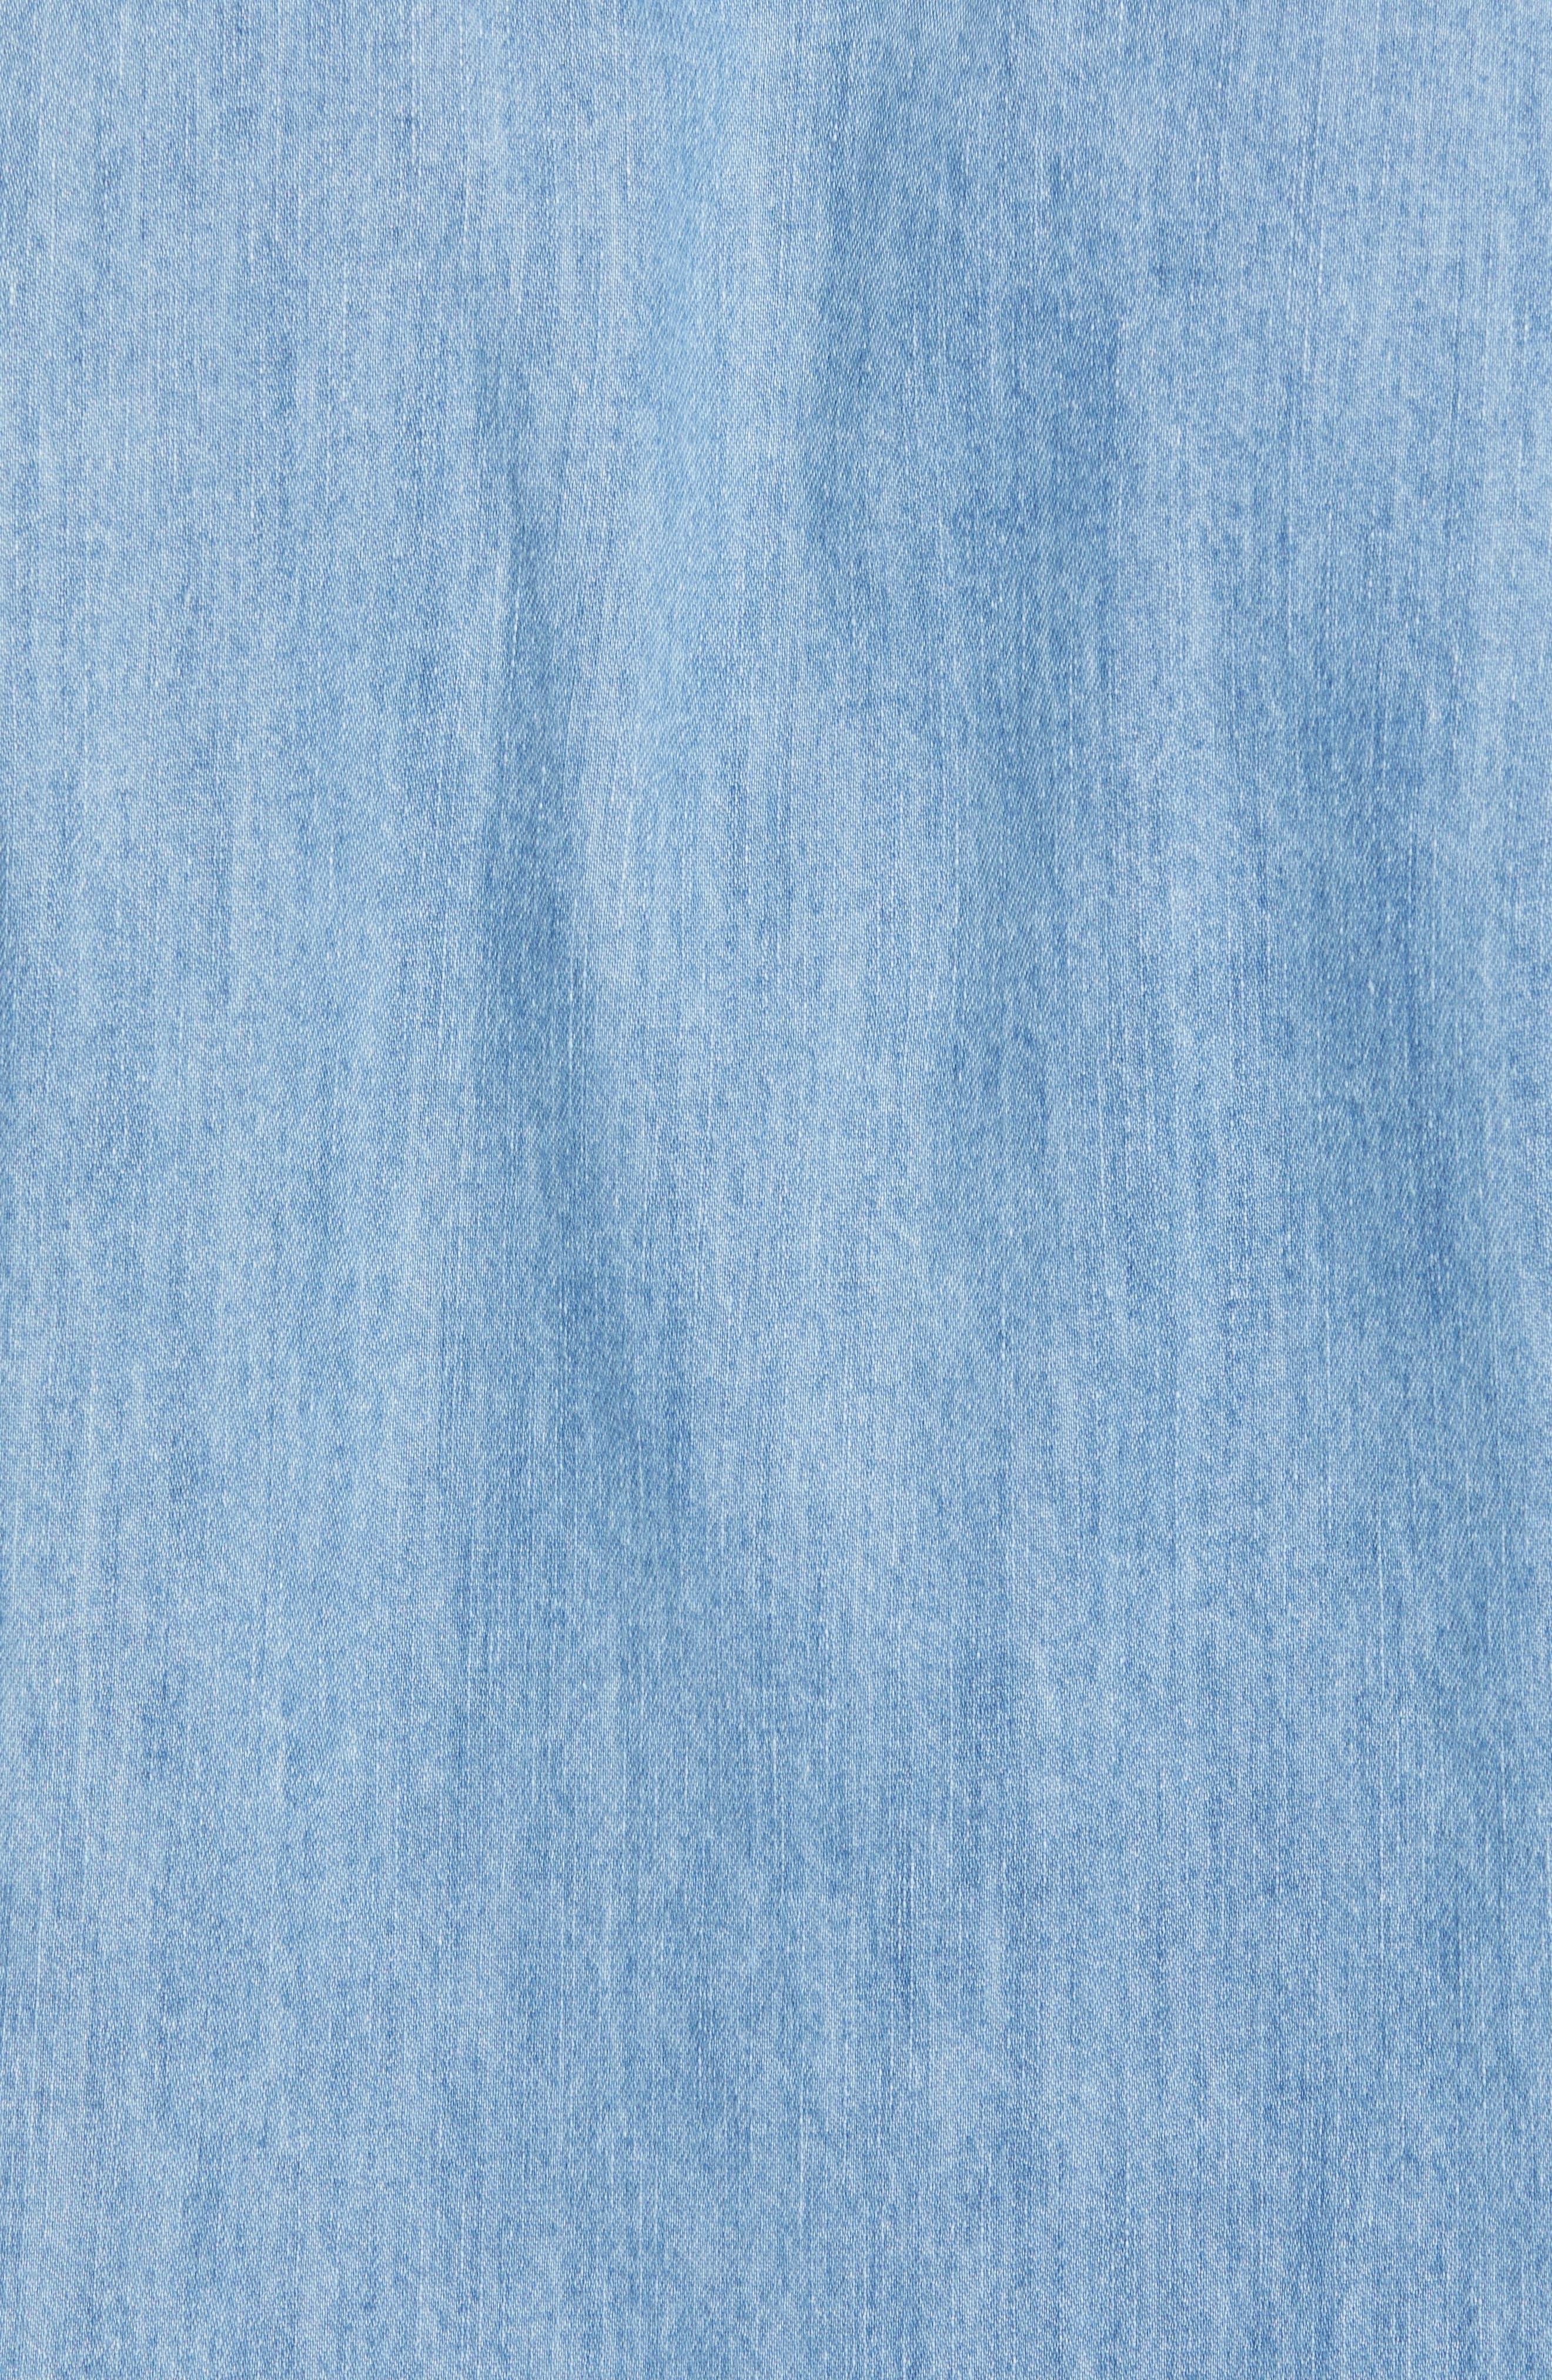 Amsterdams Blauw Pocket Square Chambray Sport Shirt,                             Alternate thumbnail 5, color,                             DENIM BLUE